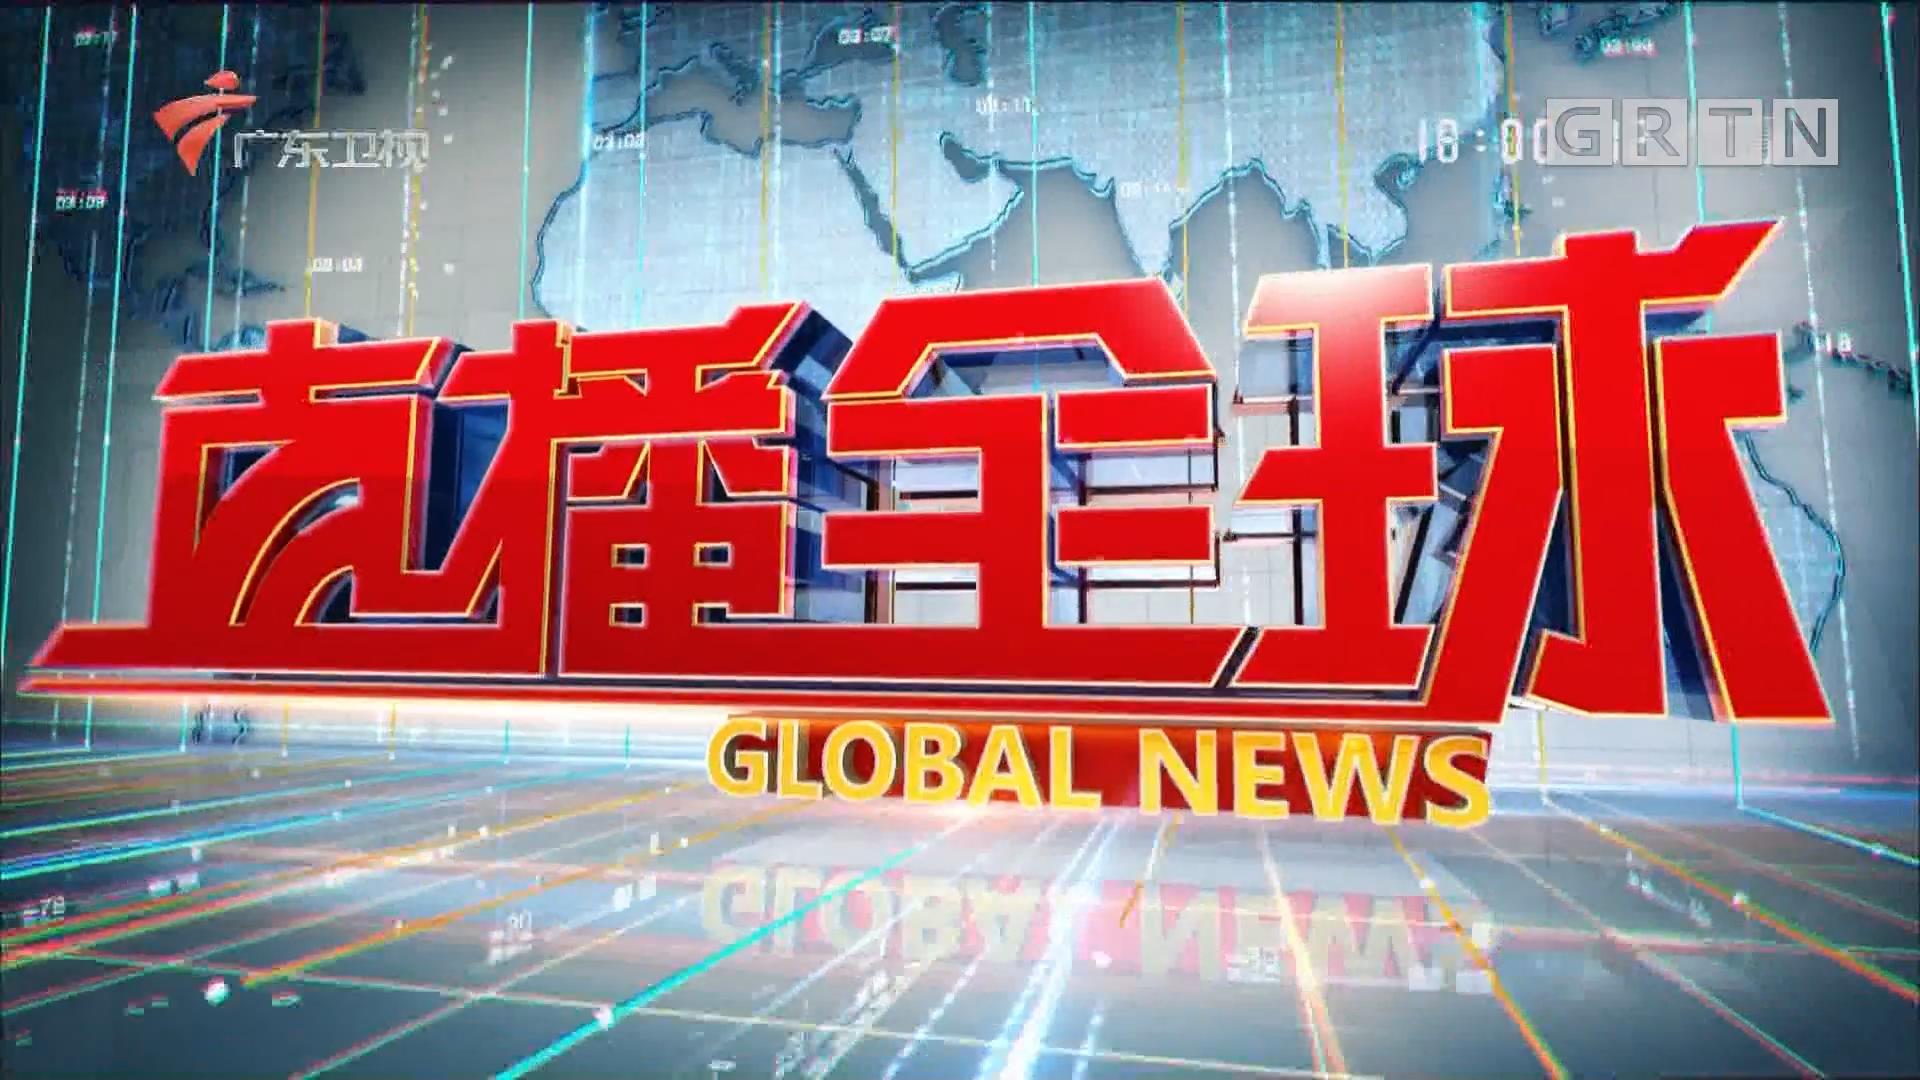 [HD][2019-05-16]直播全球:亚洲文明周活动今启动:中外游?#22303;?#30053;亚洲各国风情